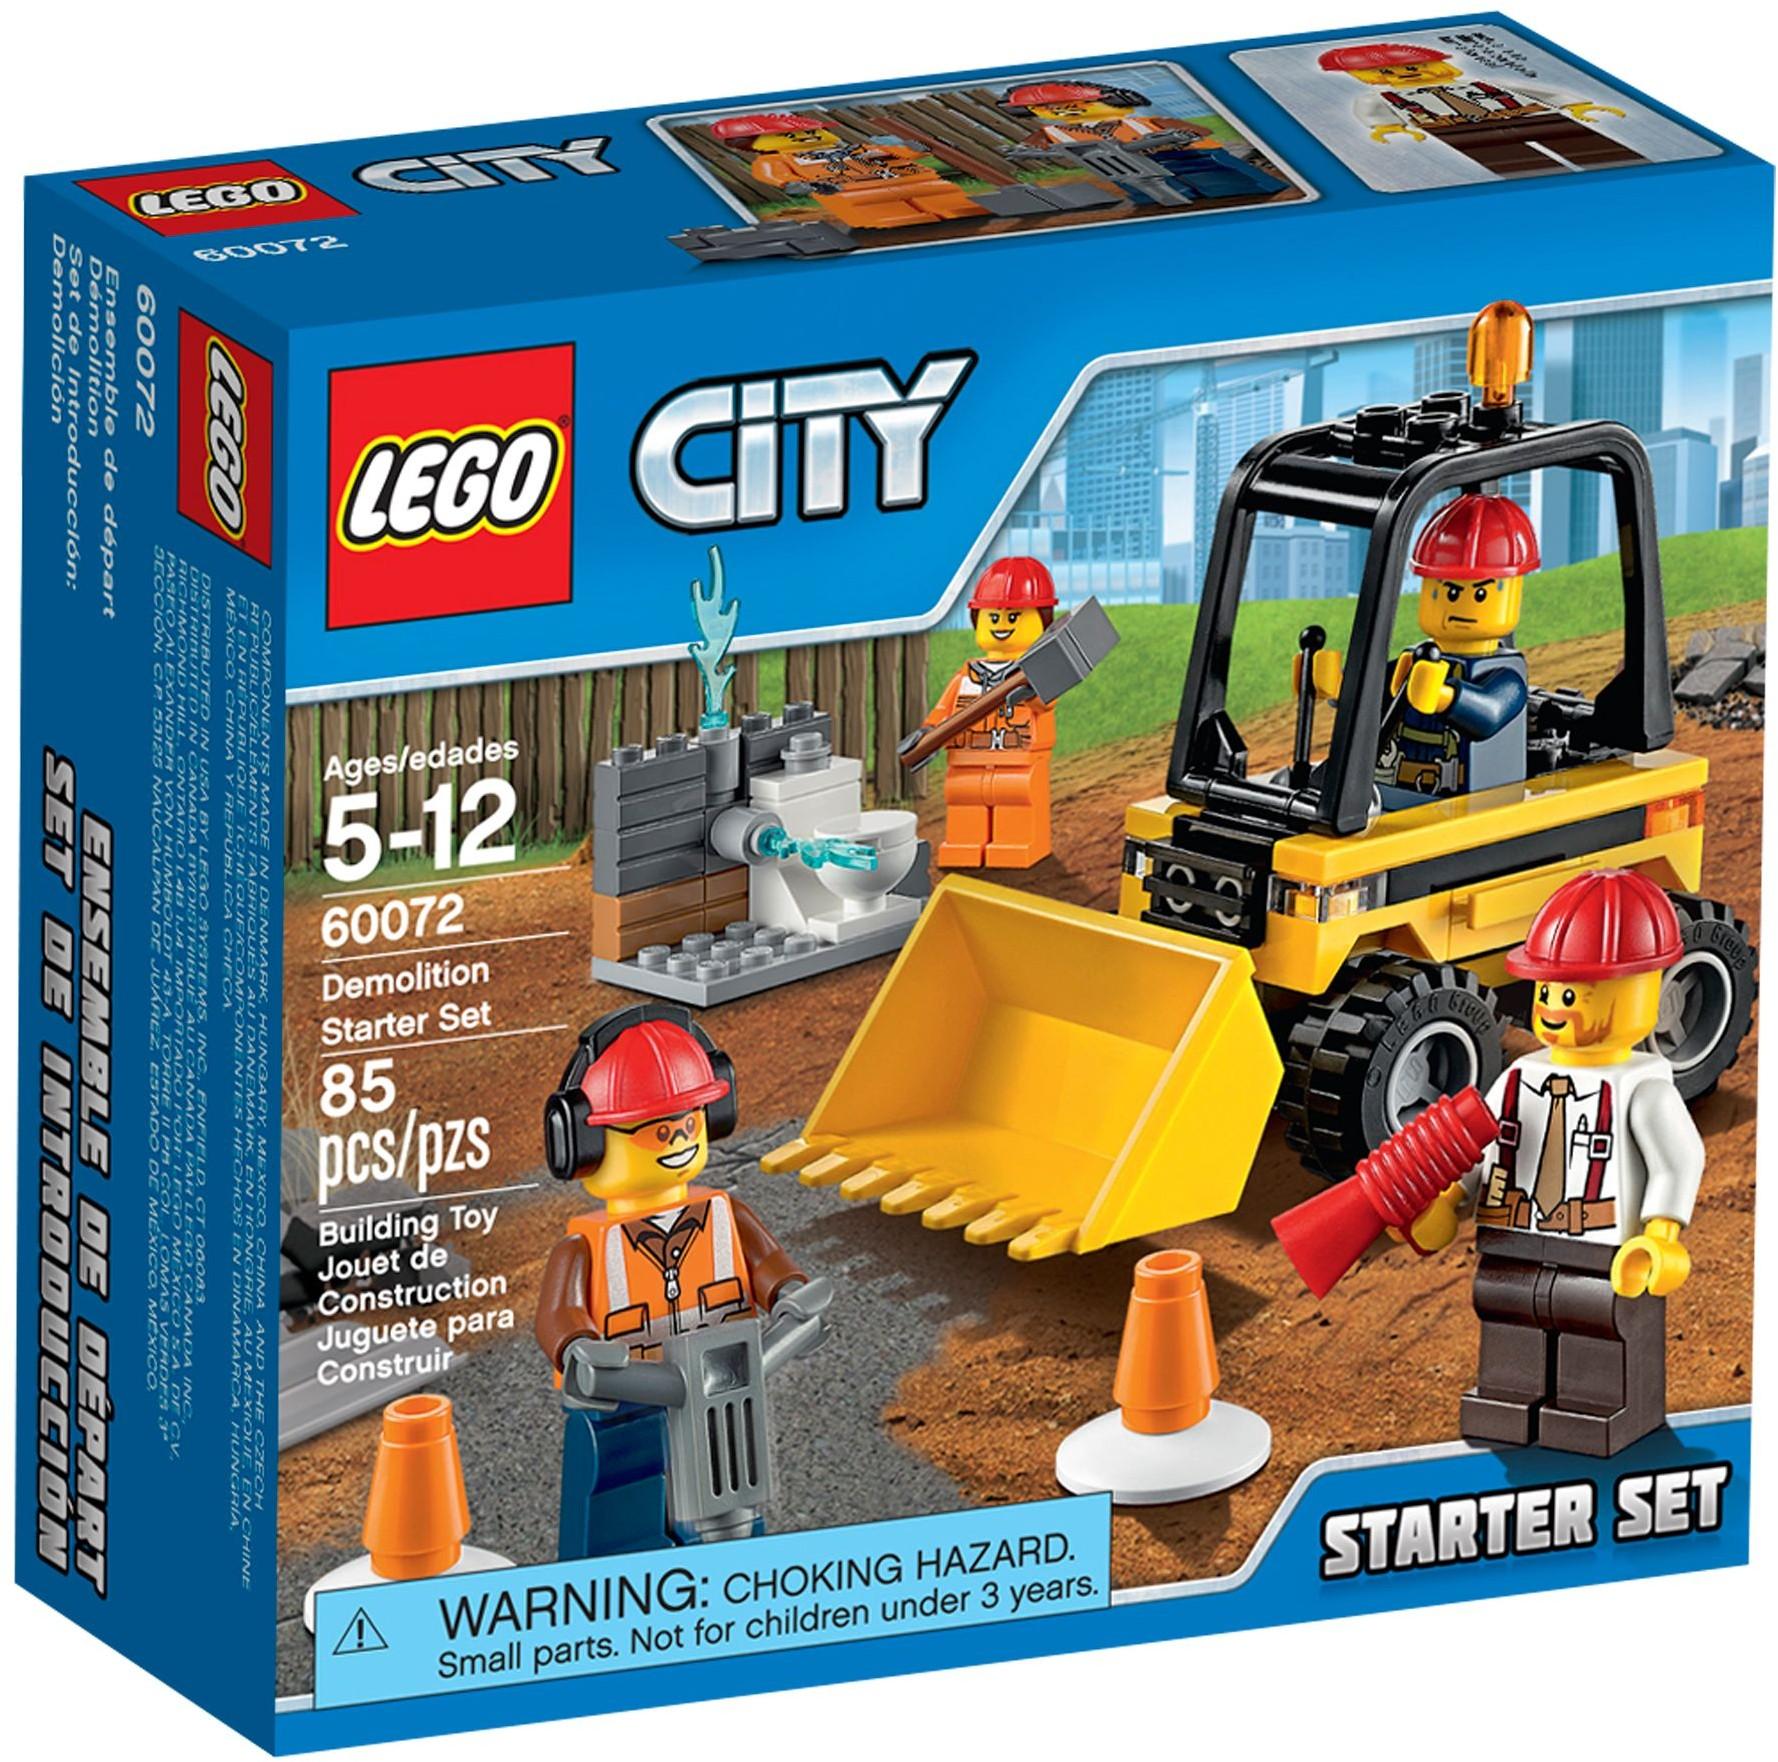 Info Harga Demolition Site 60076 Update 2018 Produk Ukm Bumn Dat Edwina Bali Orange Slip On Lego 60072 Starter Set